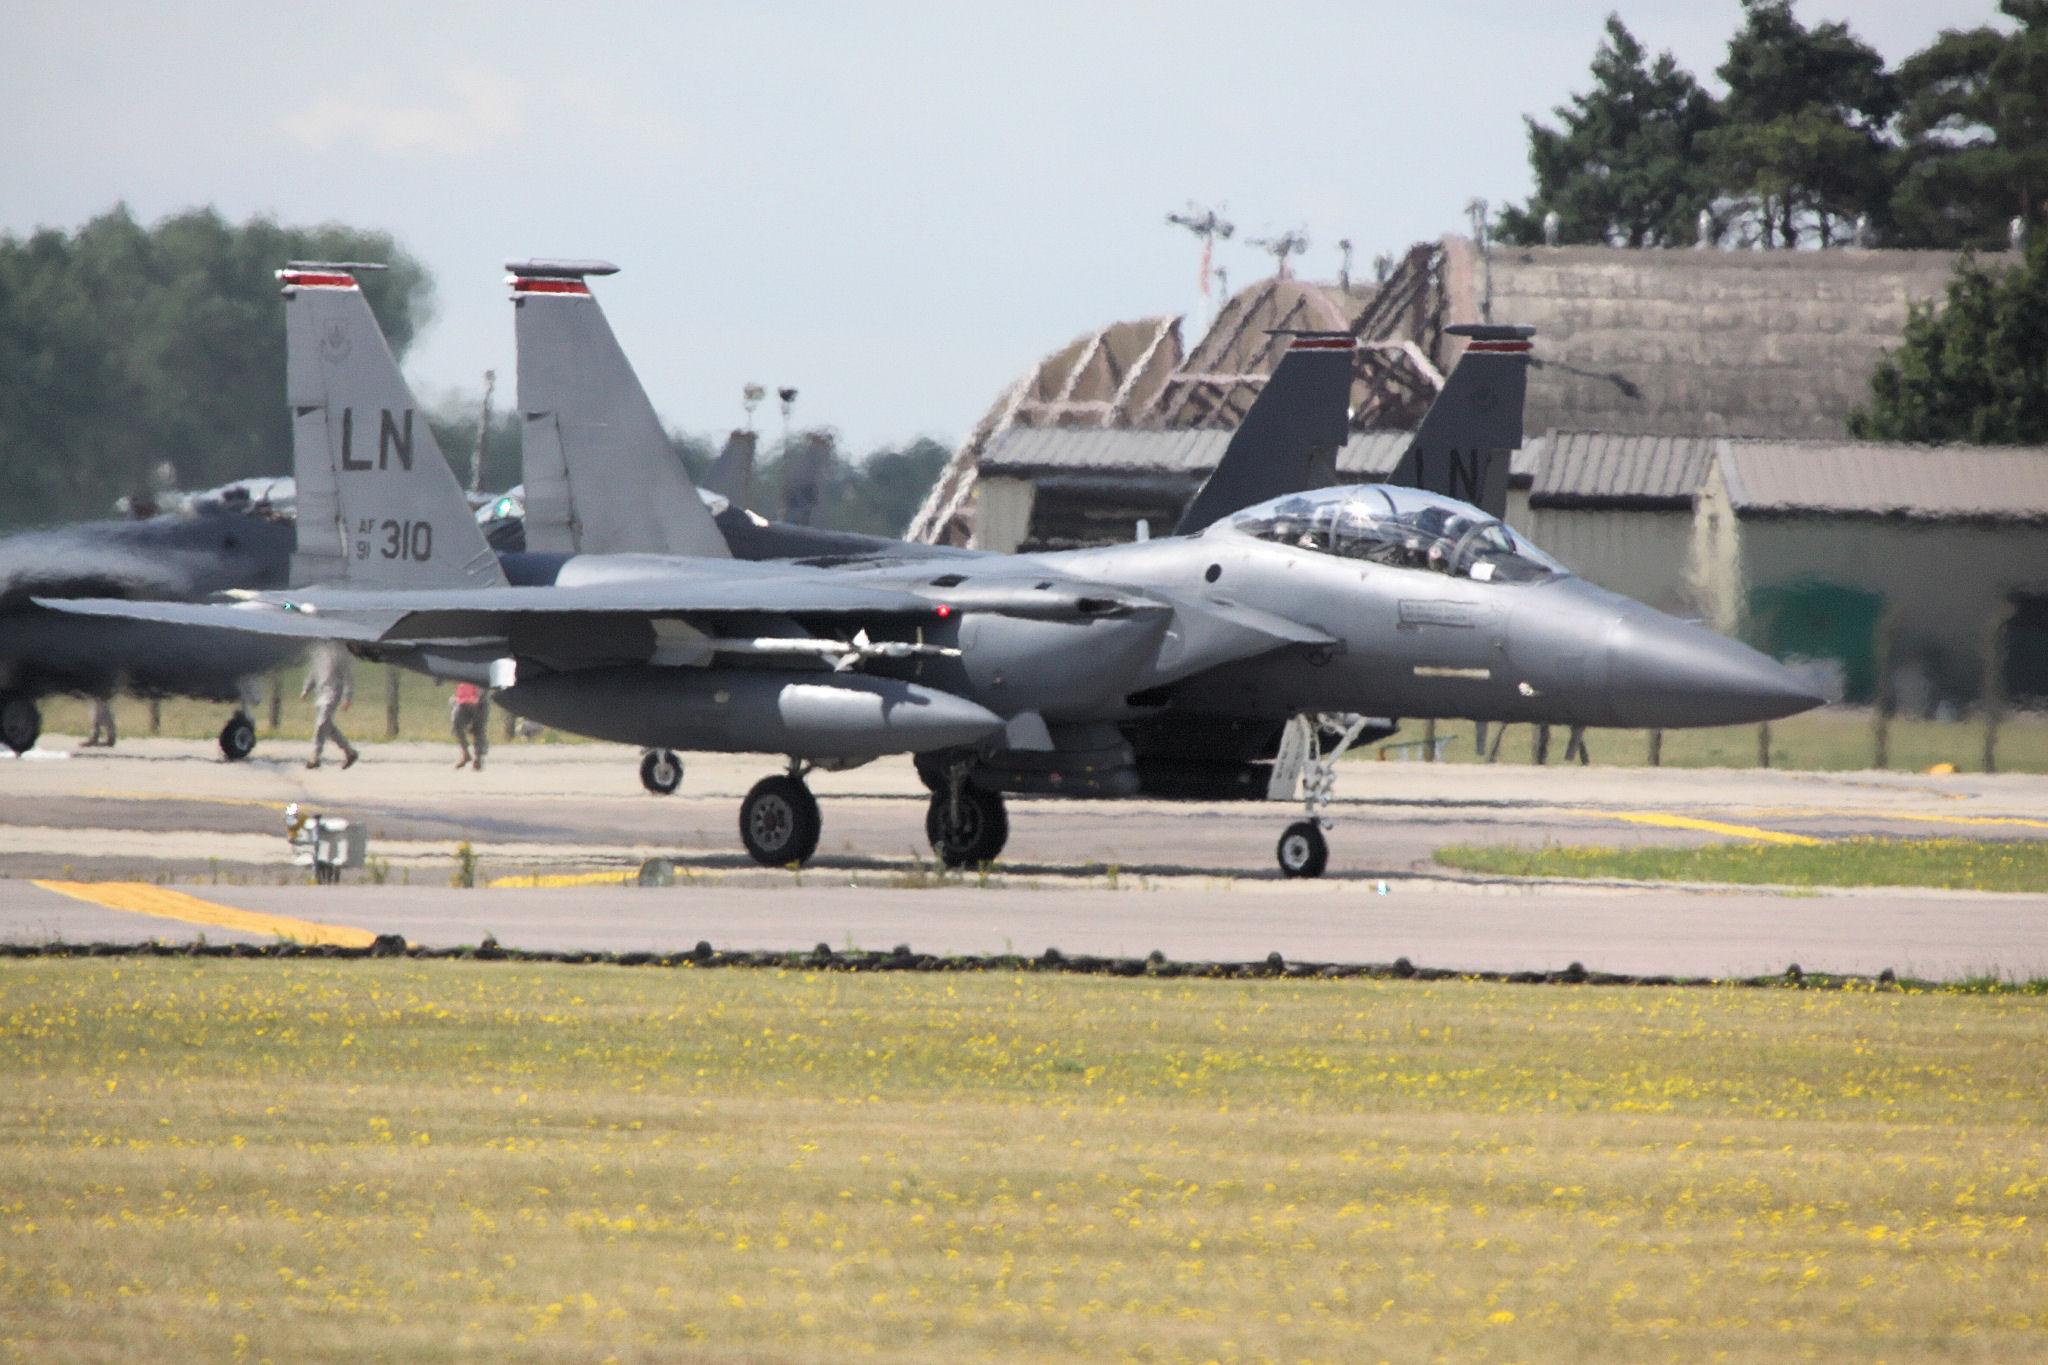 RAF Lakenheath dating